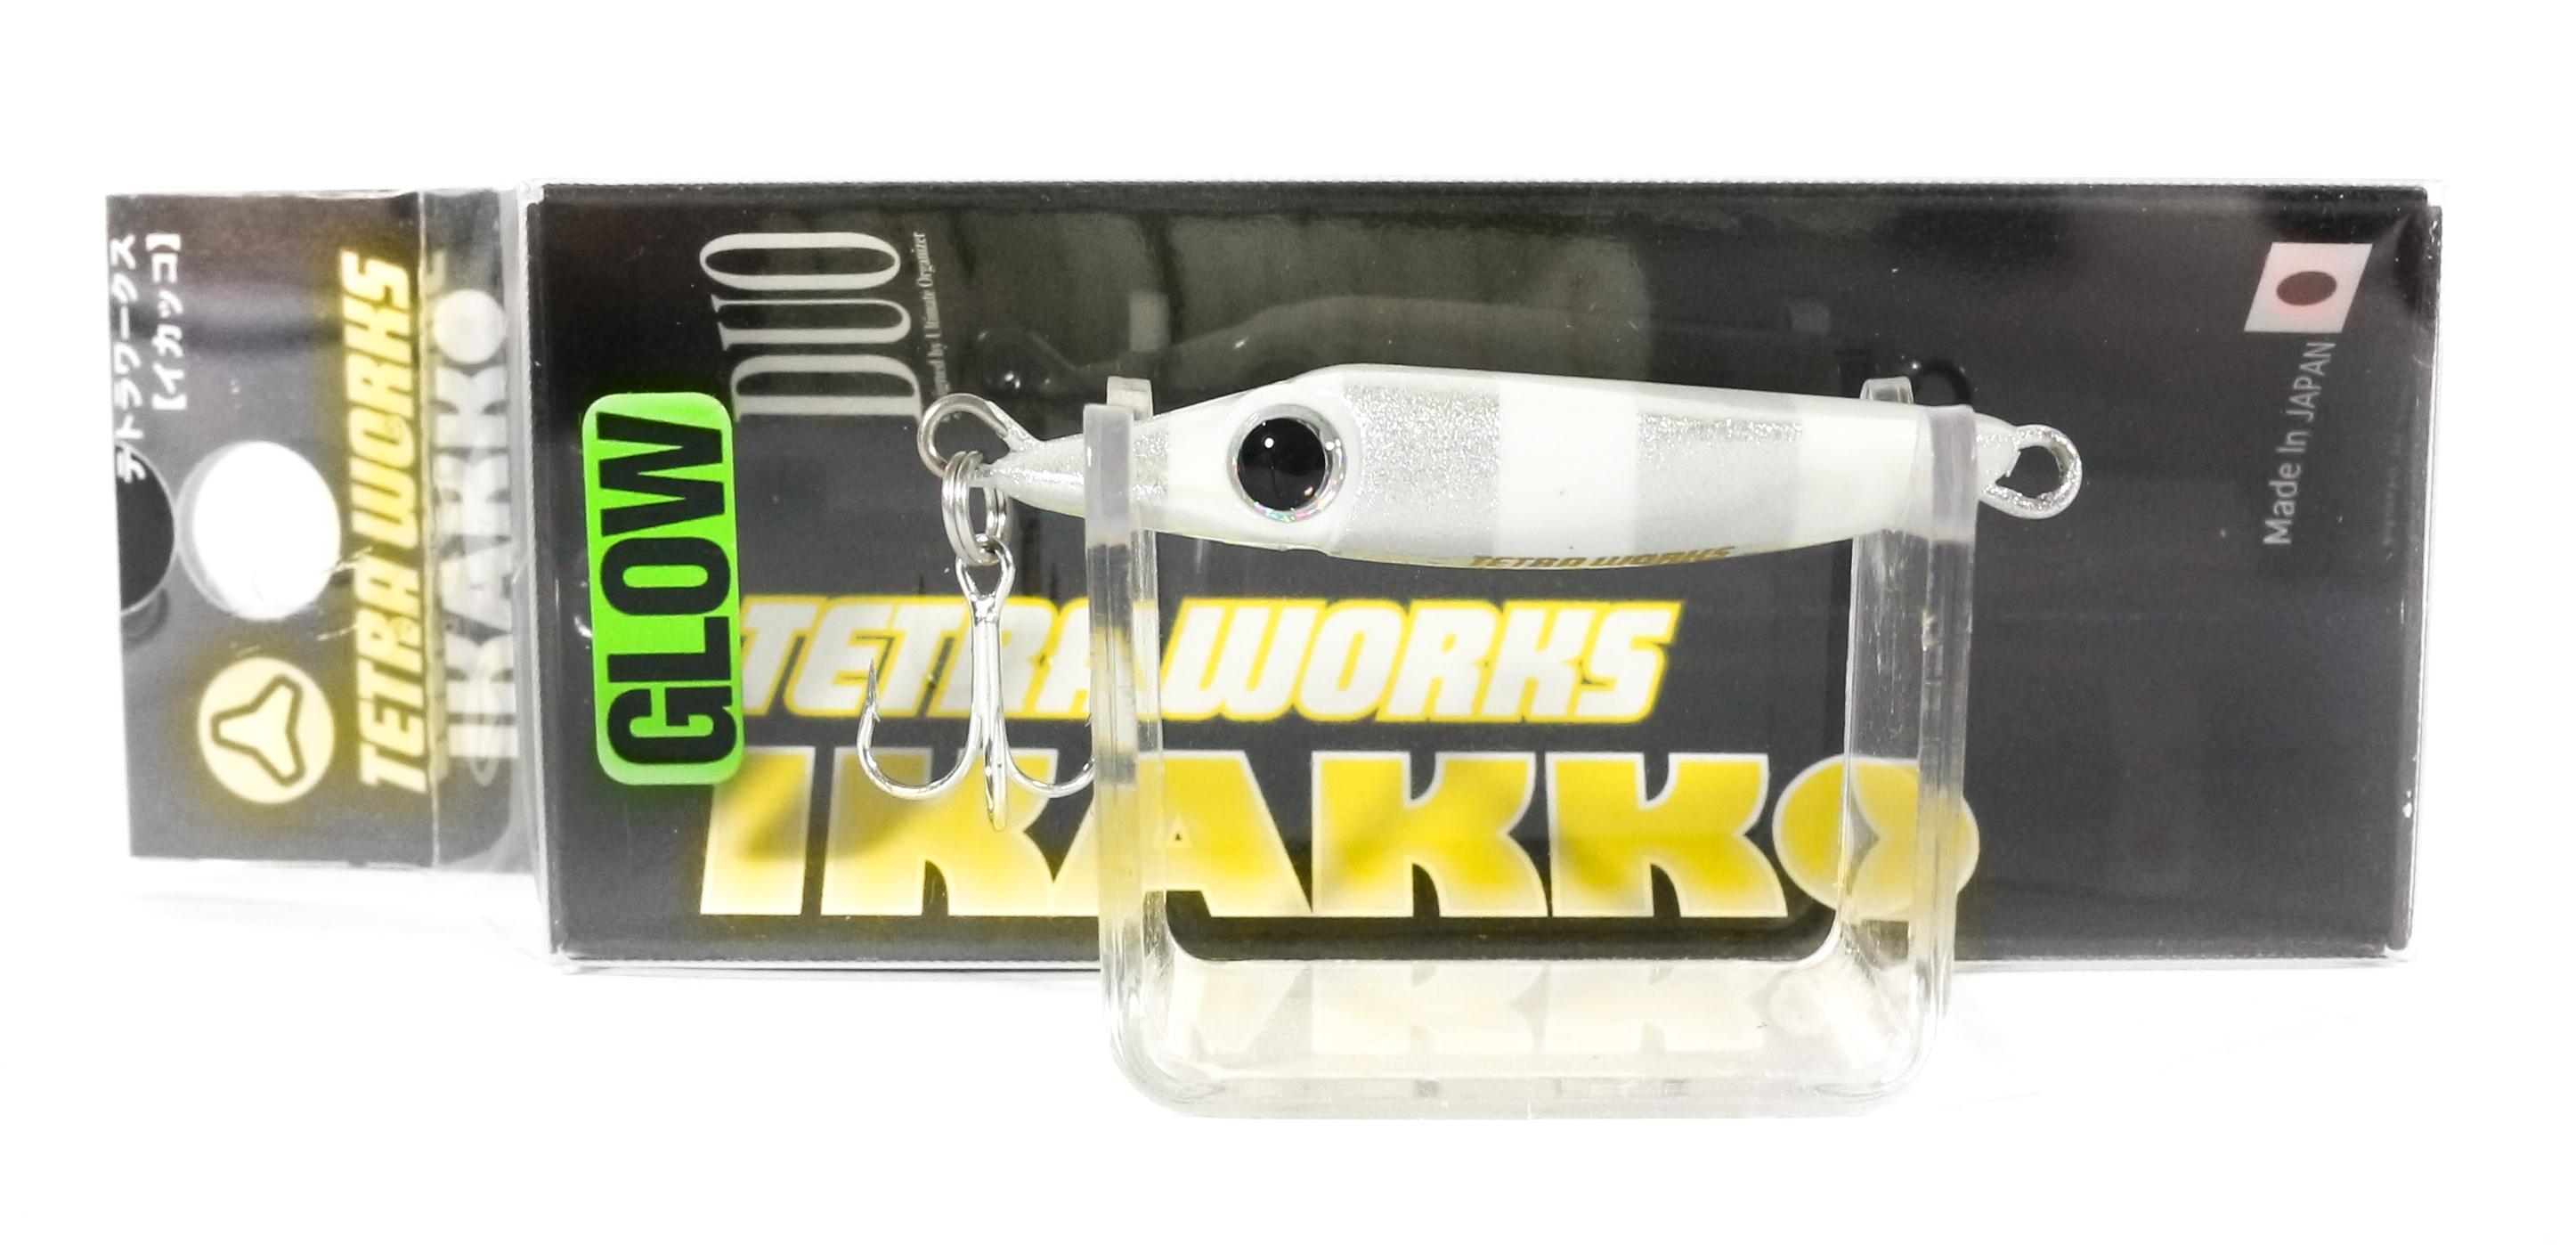 Duo Tetra Works Ikakko 38 mm Sinking Lure ACC0504 (6740)